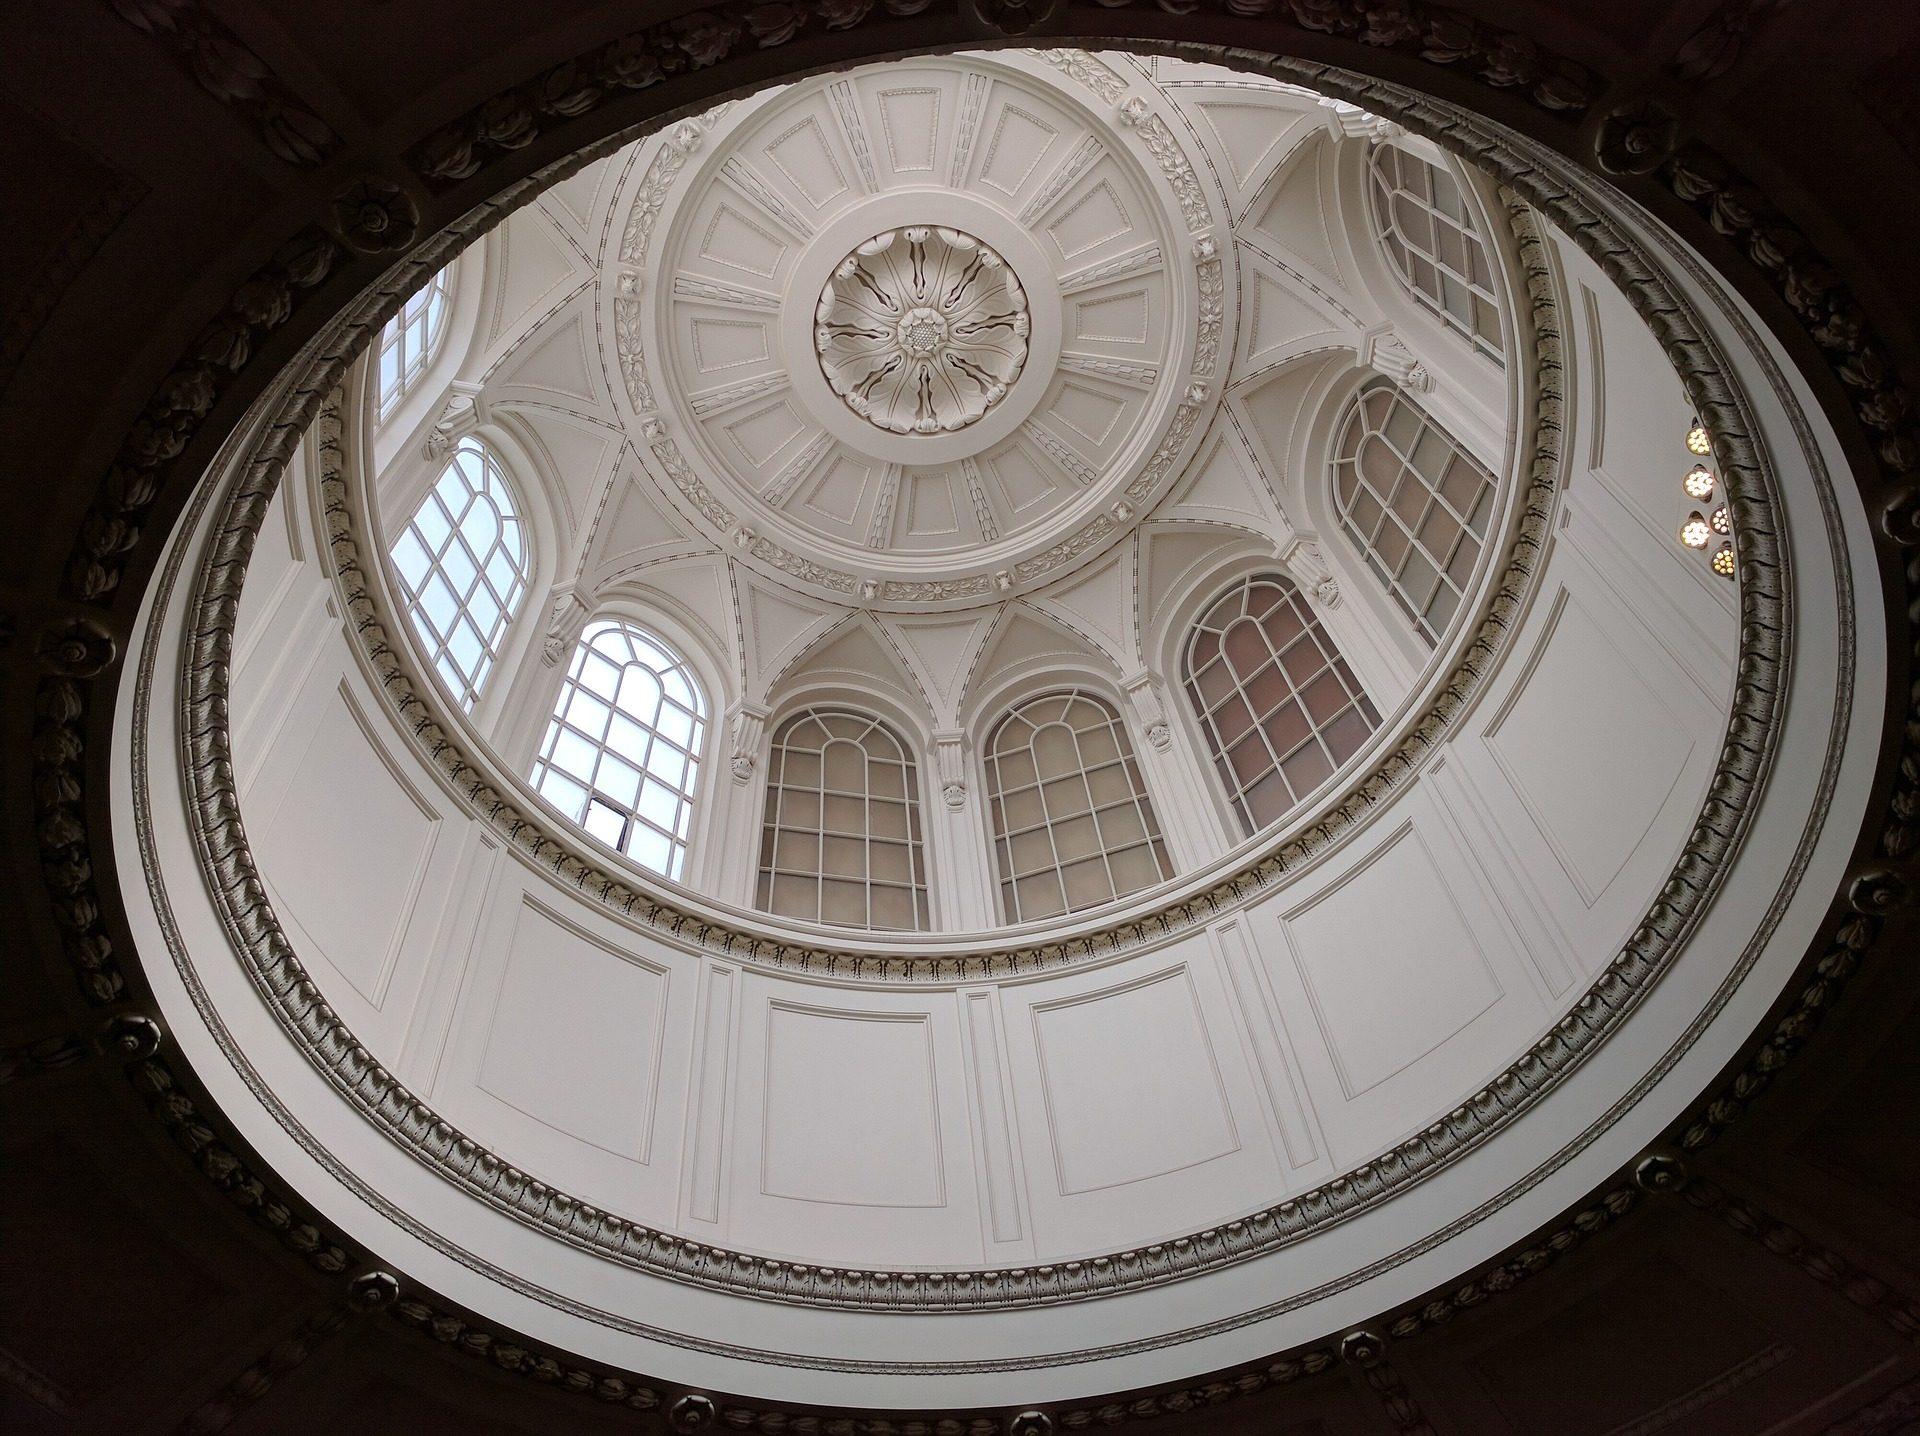 Vault, Cupola, Arcos, Windows, architettura - Sfondi HD - Professor-falken.com